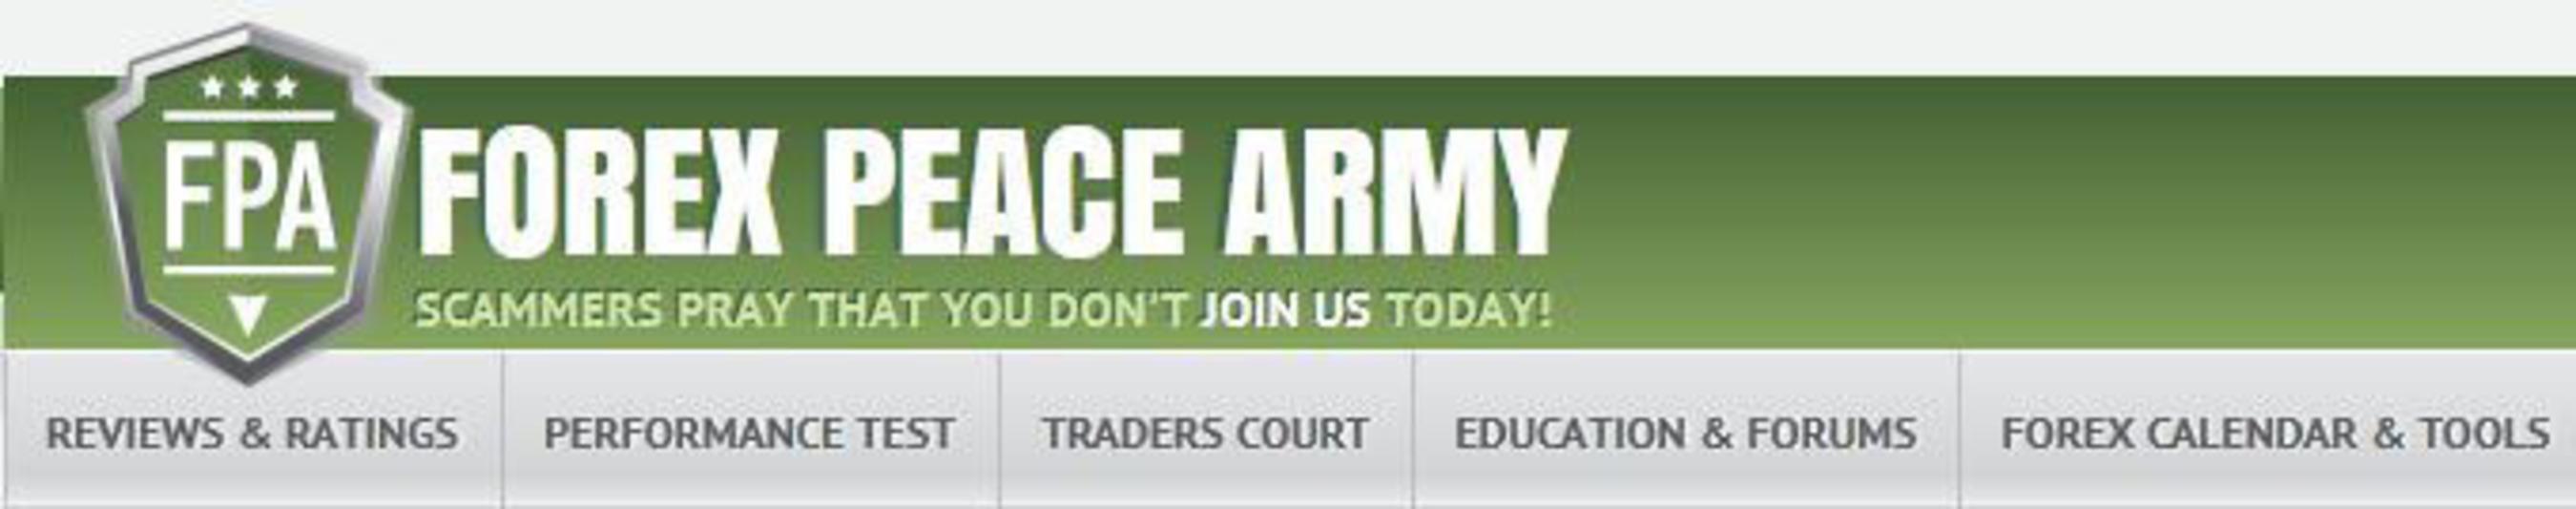 Forex Peace Army. (PRNewsFoto/Forex Peace Army) (PRNewsFoto/FOREX PEACE ARMY)